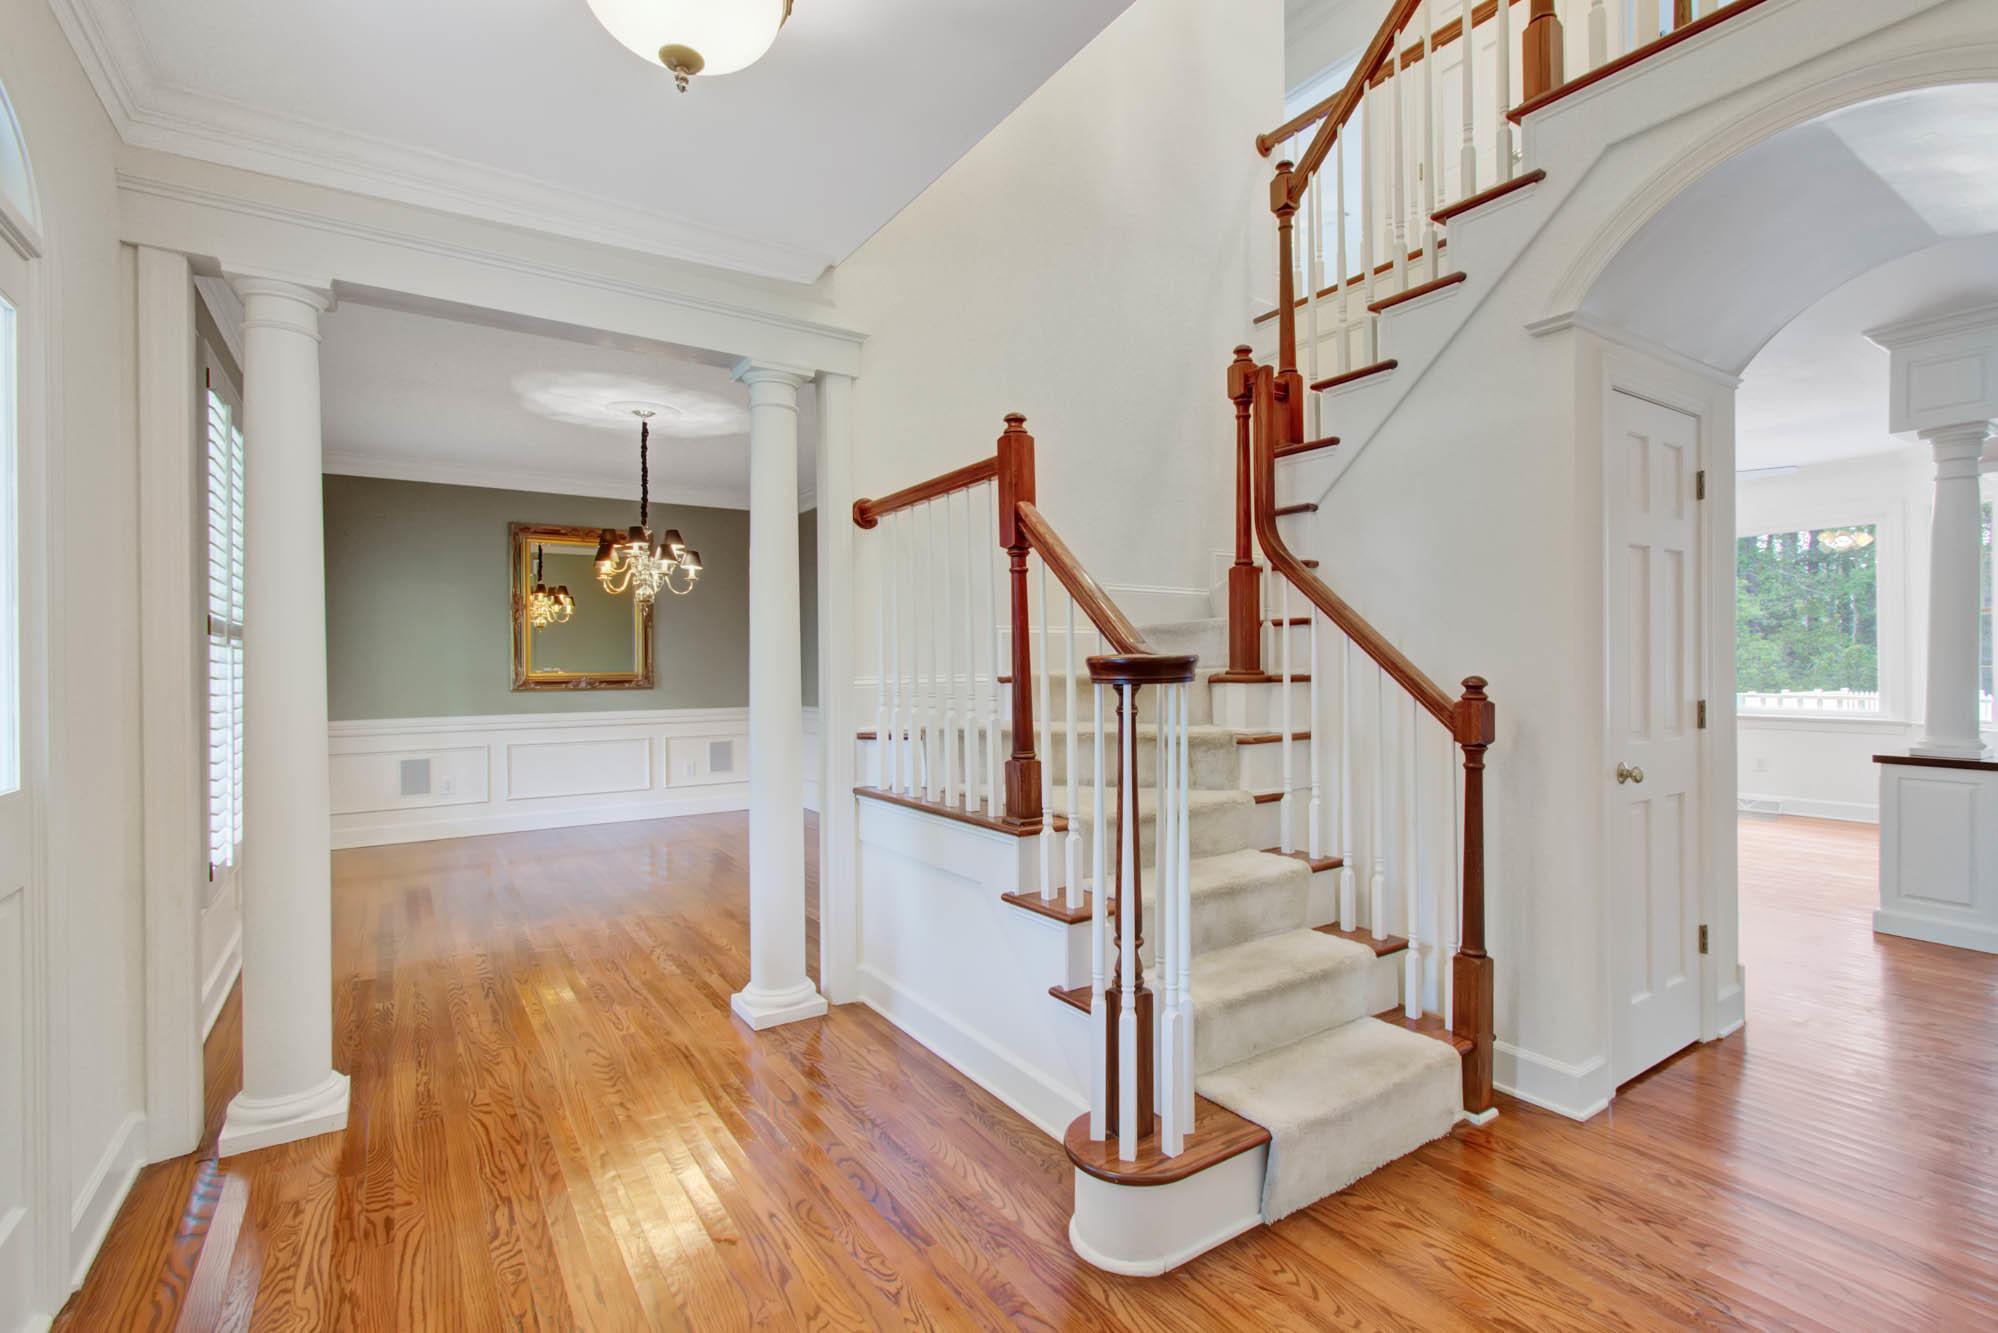 Dunes West Homes For Sale - 3515 Colonel Vanderhorst, Mount Pleasant, SC - 37